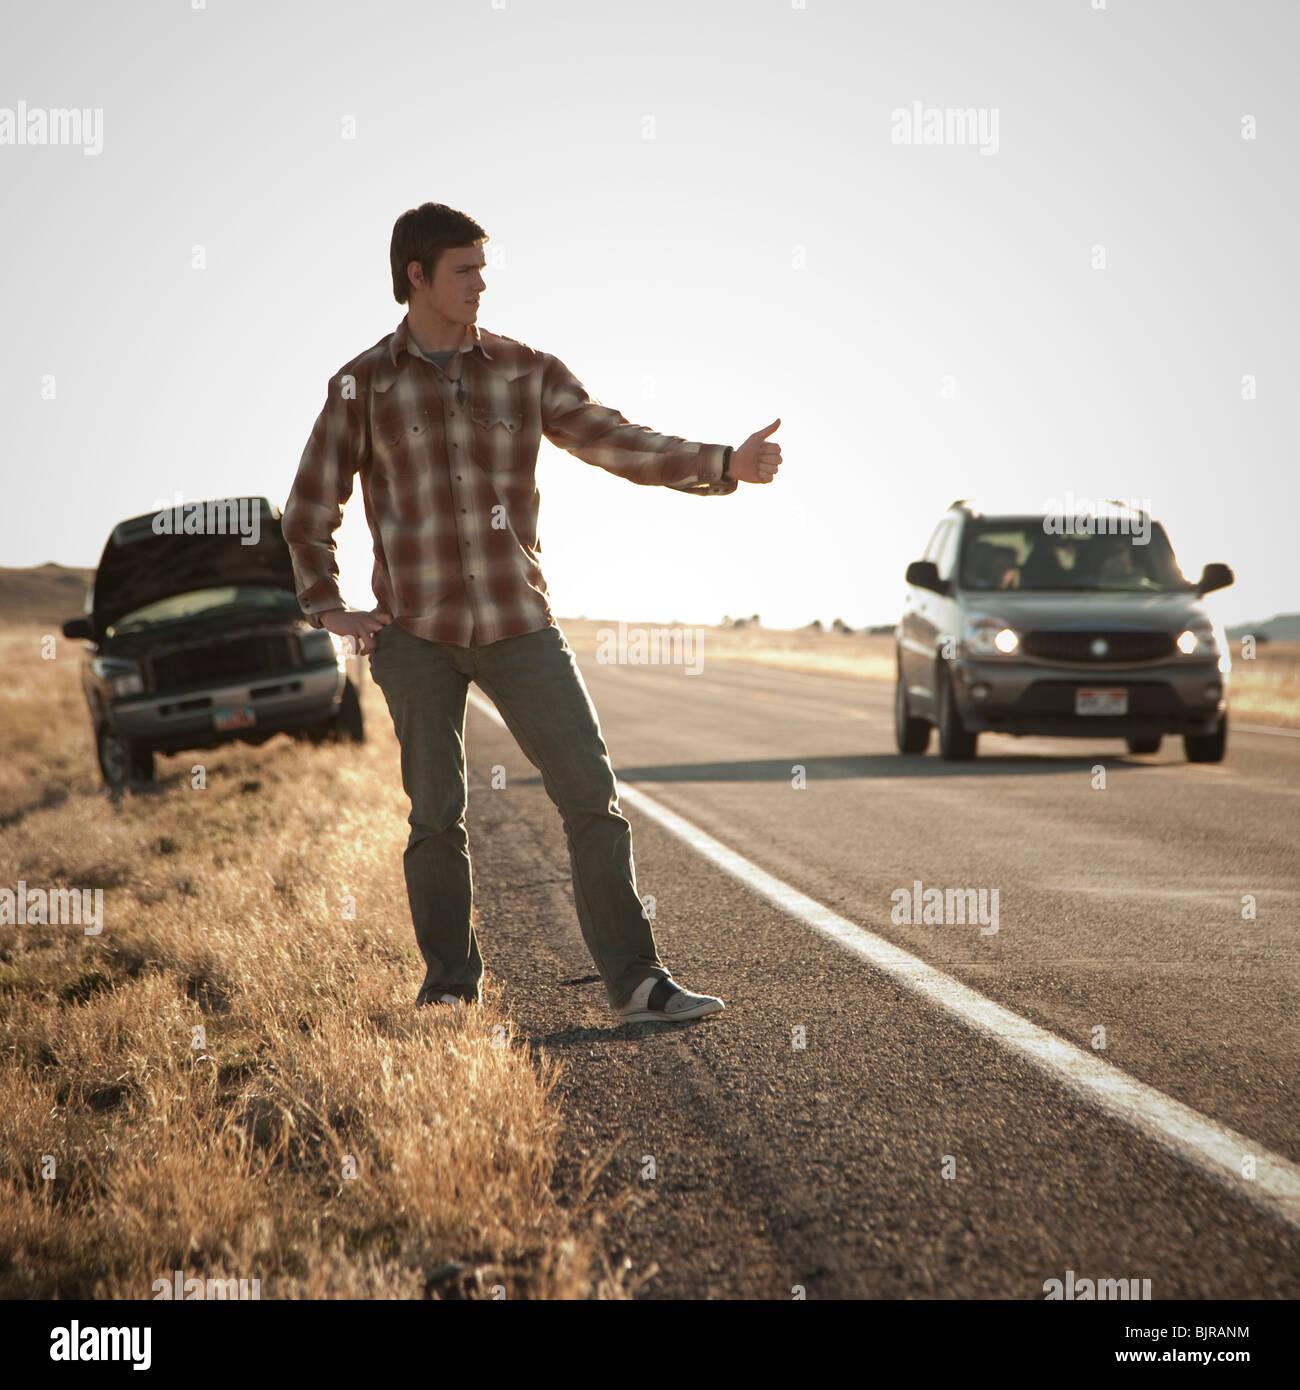 USA, Utah, man hailing on roadside, broken car in background - Stock Image